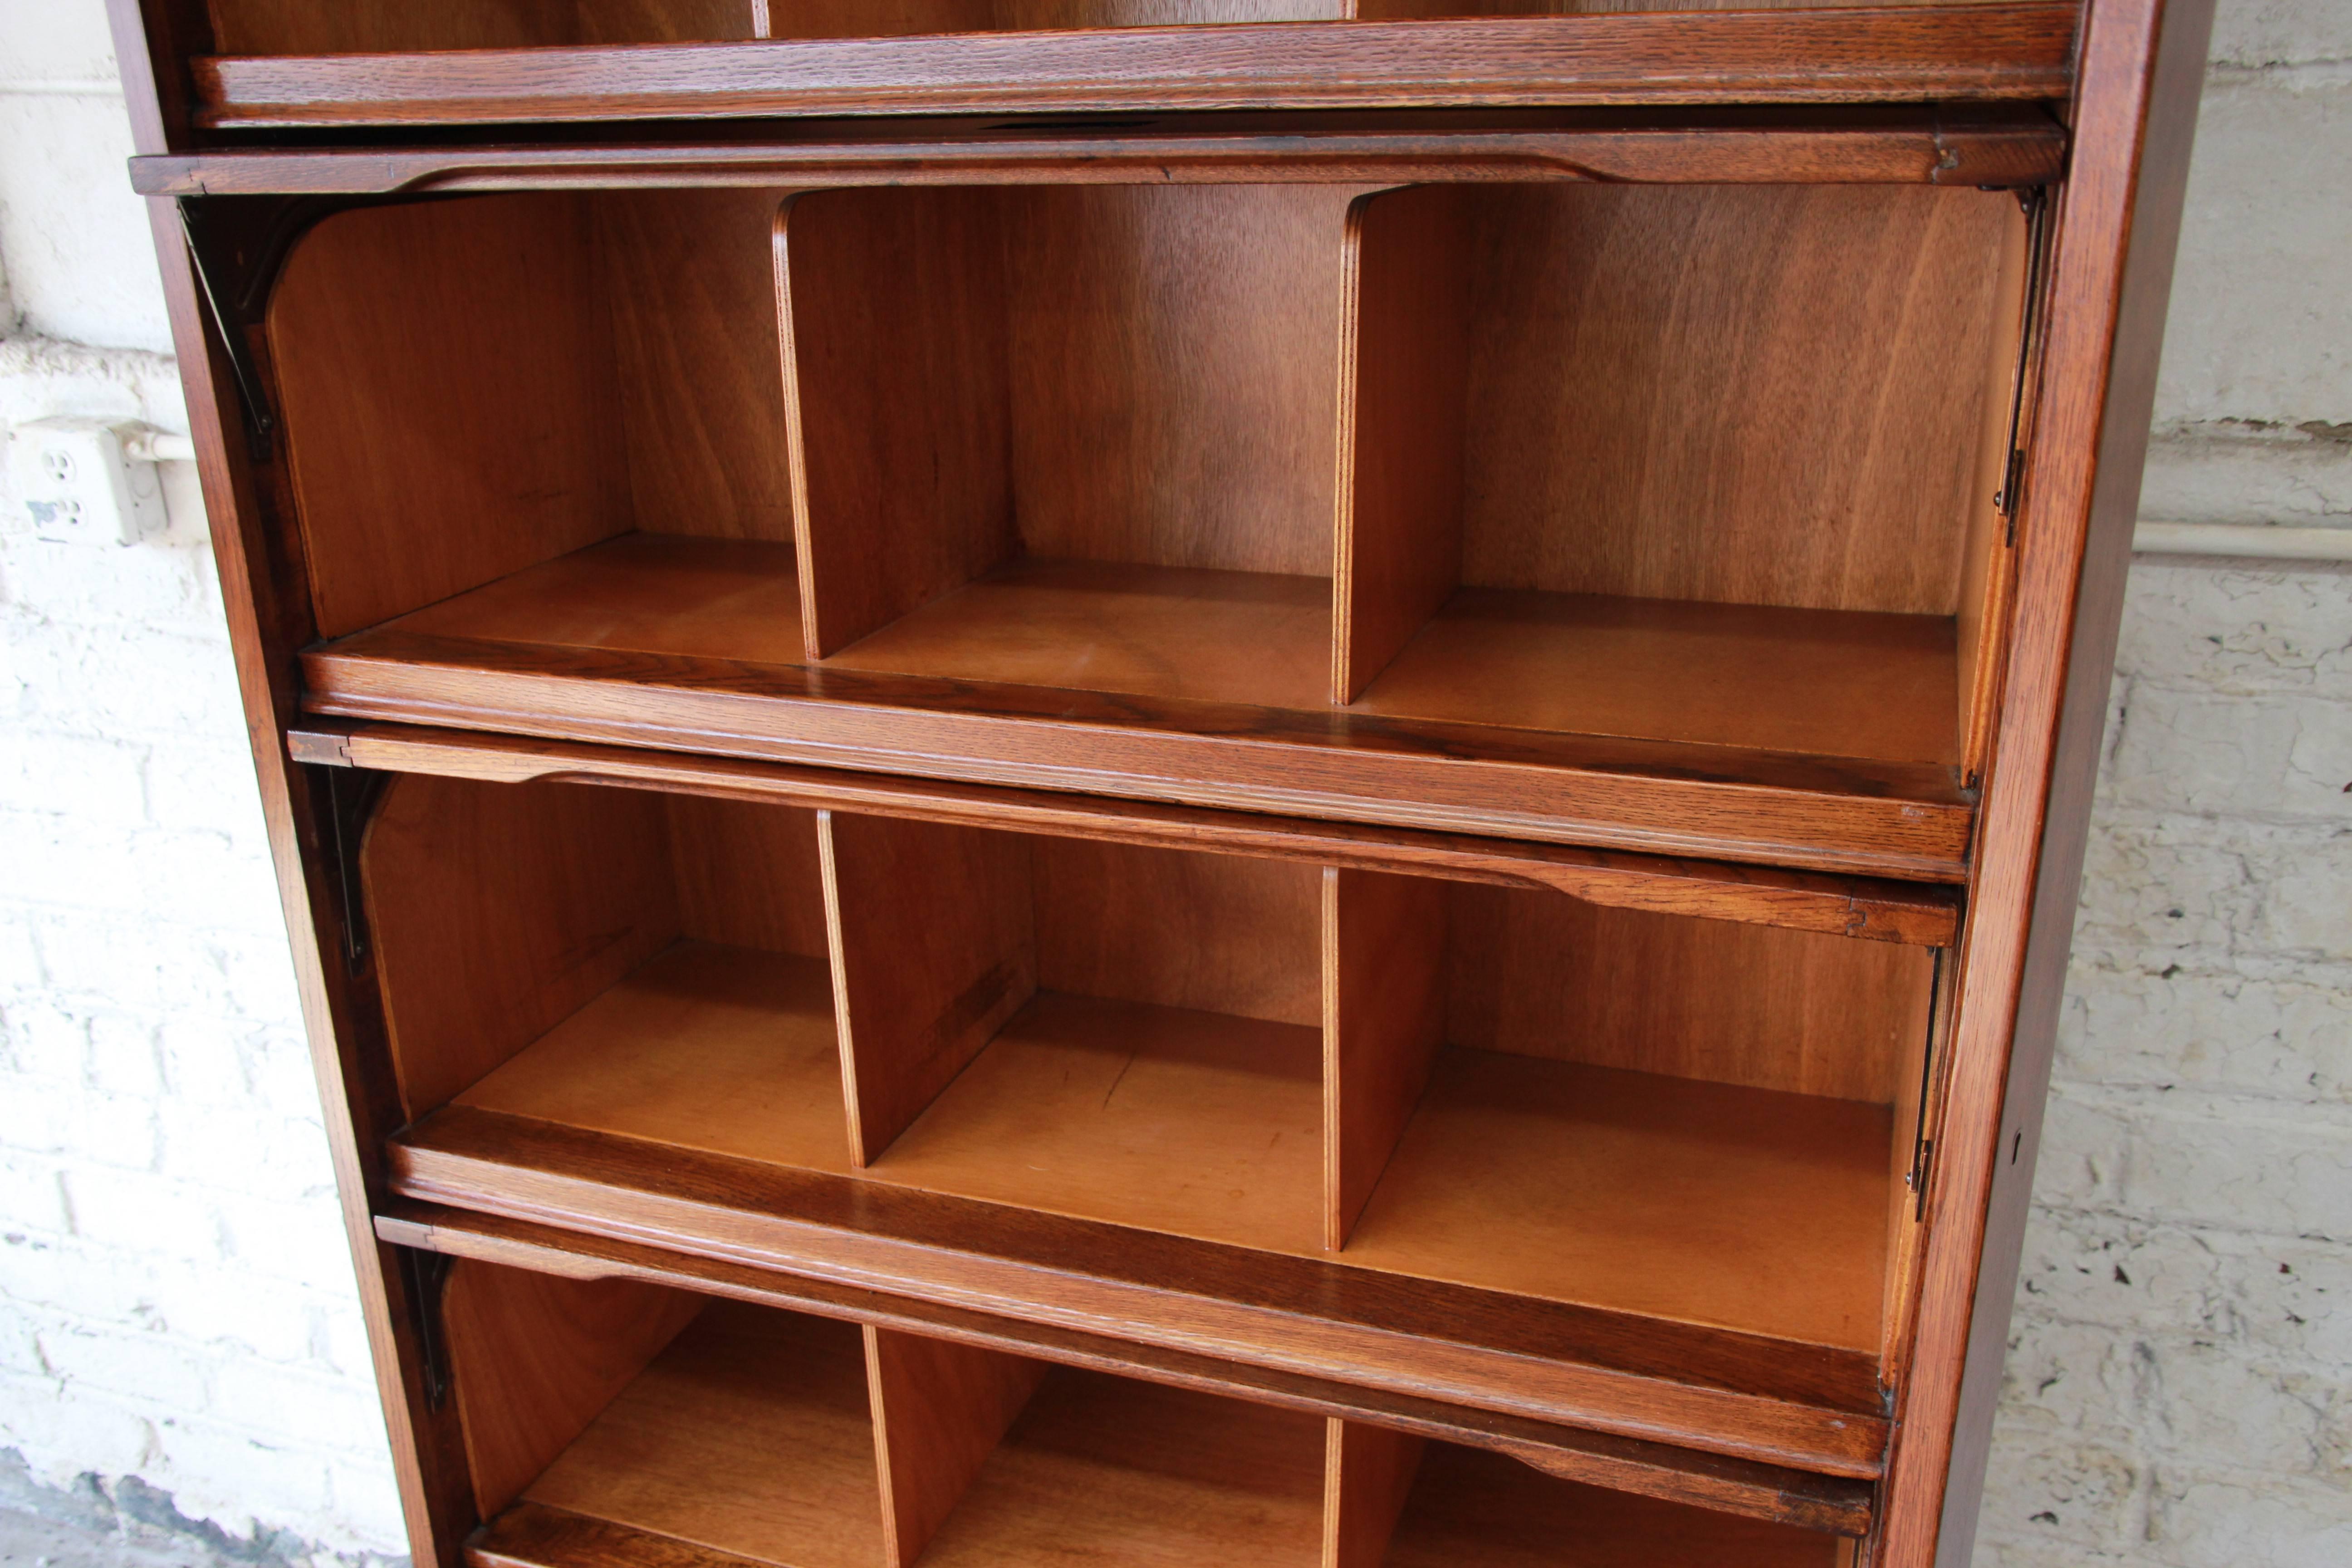 Midcentury Oak Barrister Bookcase 1950s